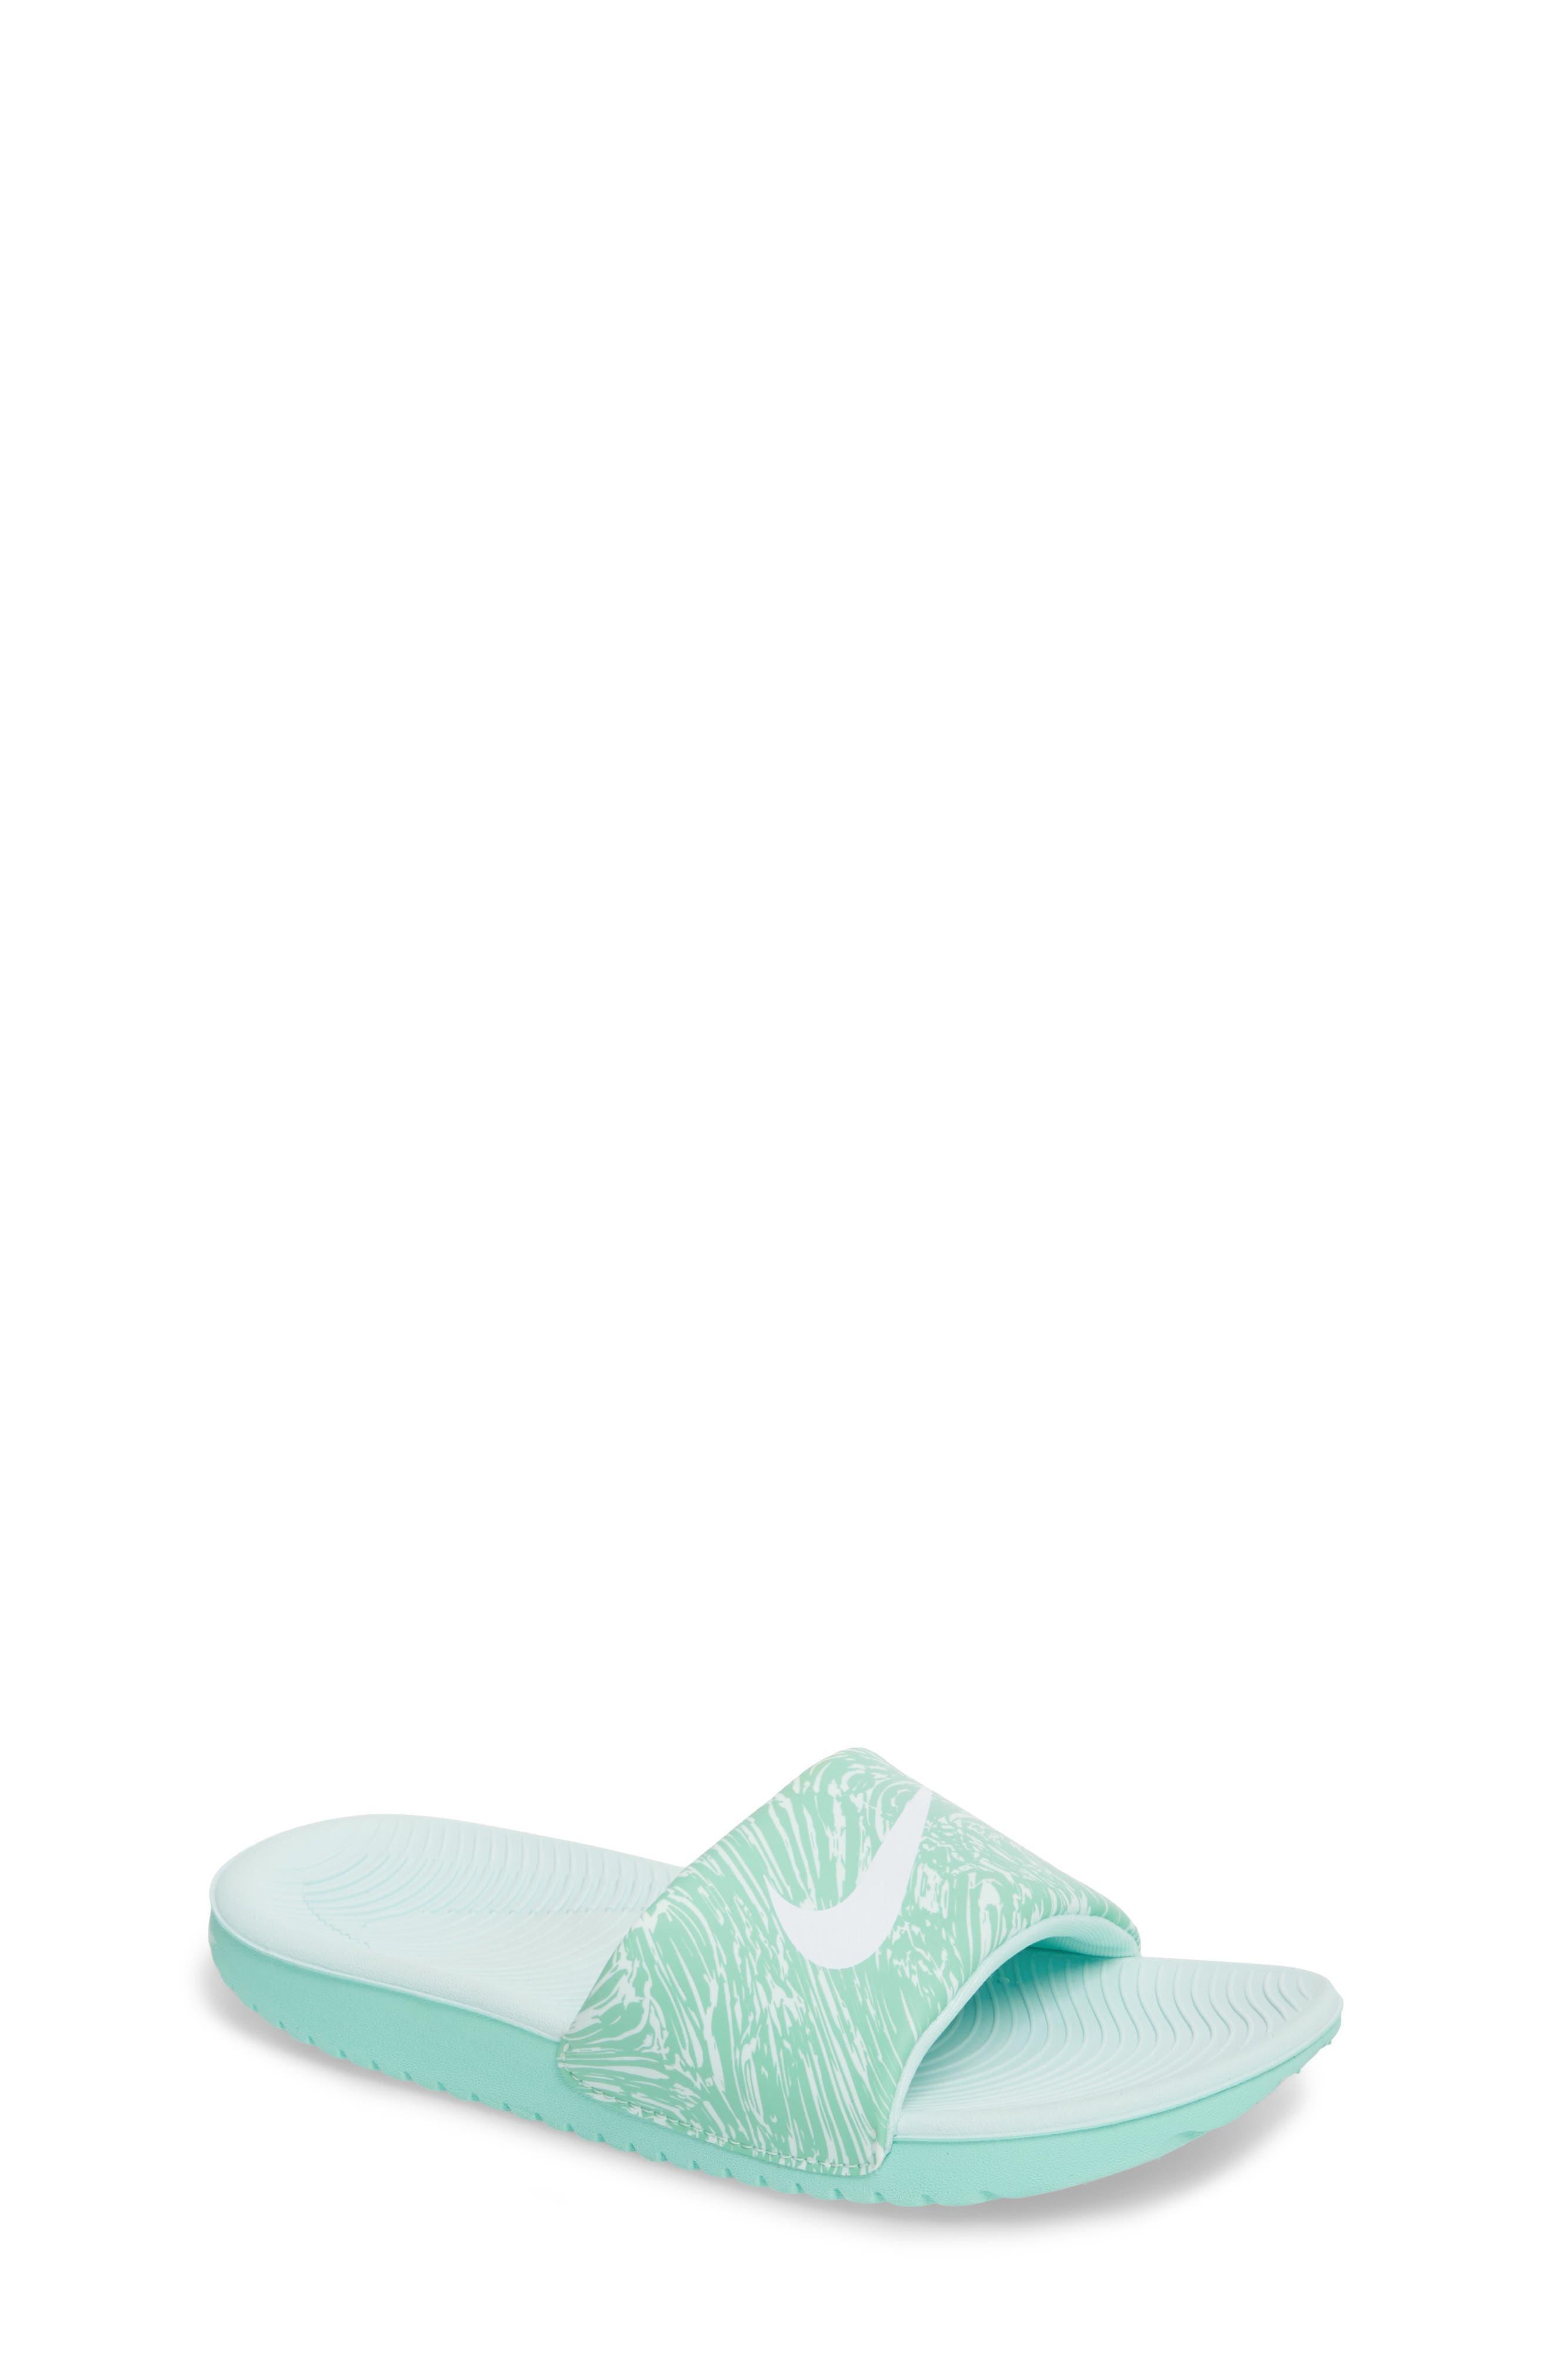 Nike 'Kawa' Print Slide Sandal (Toddler, Little Kid & Big Kid)